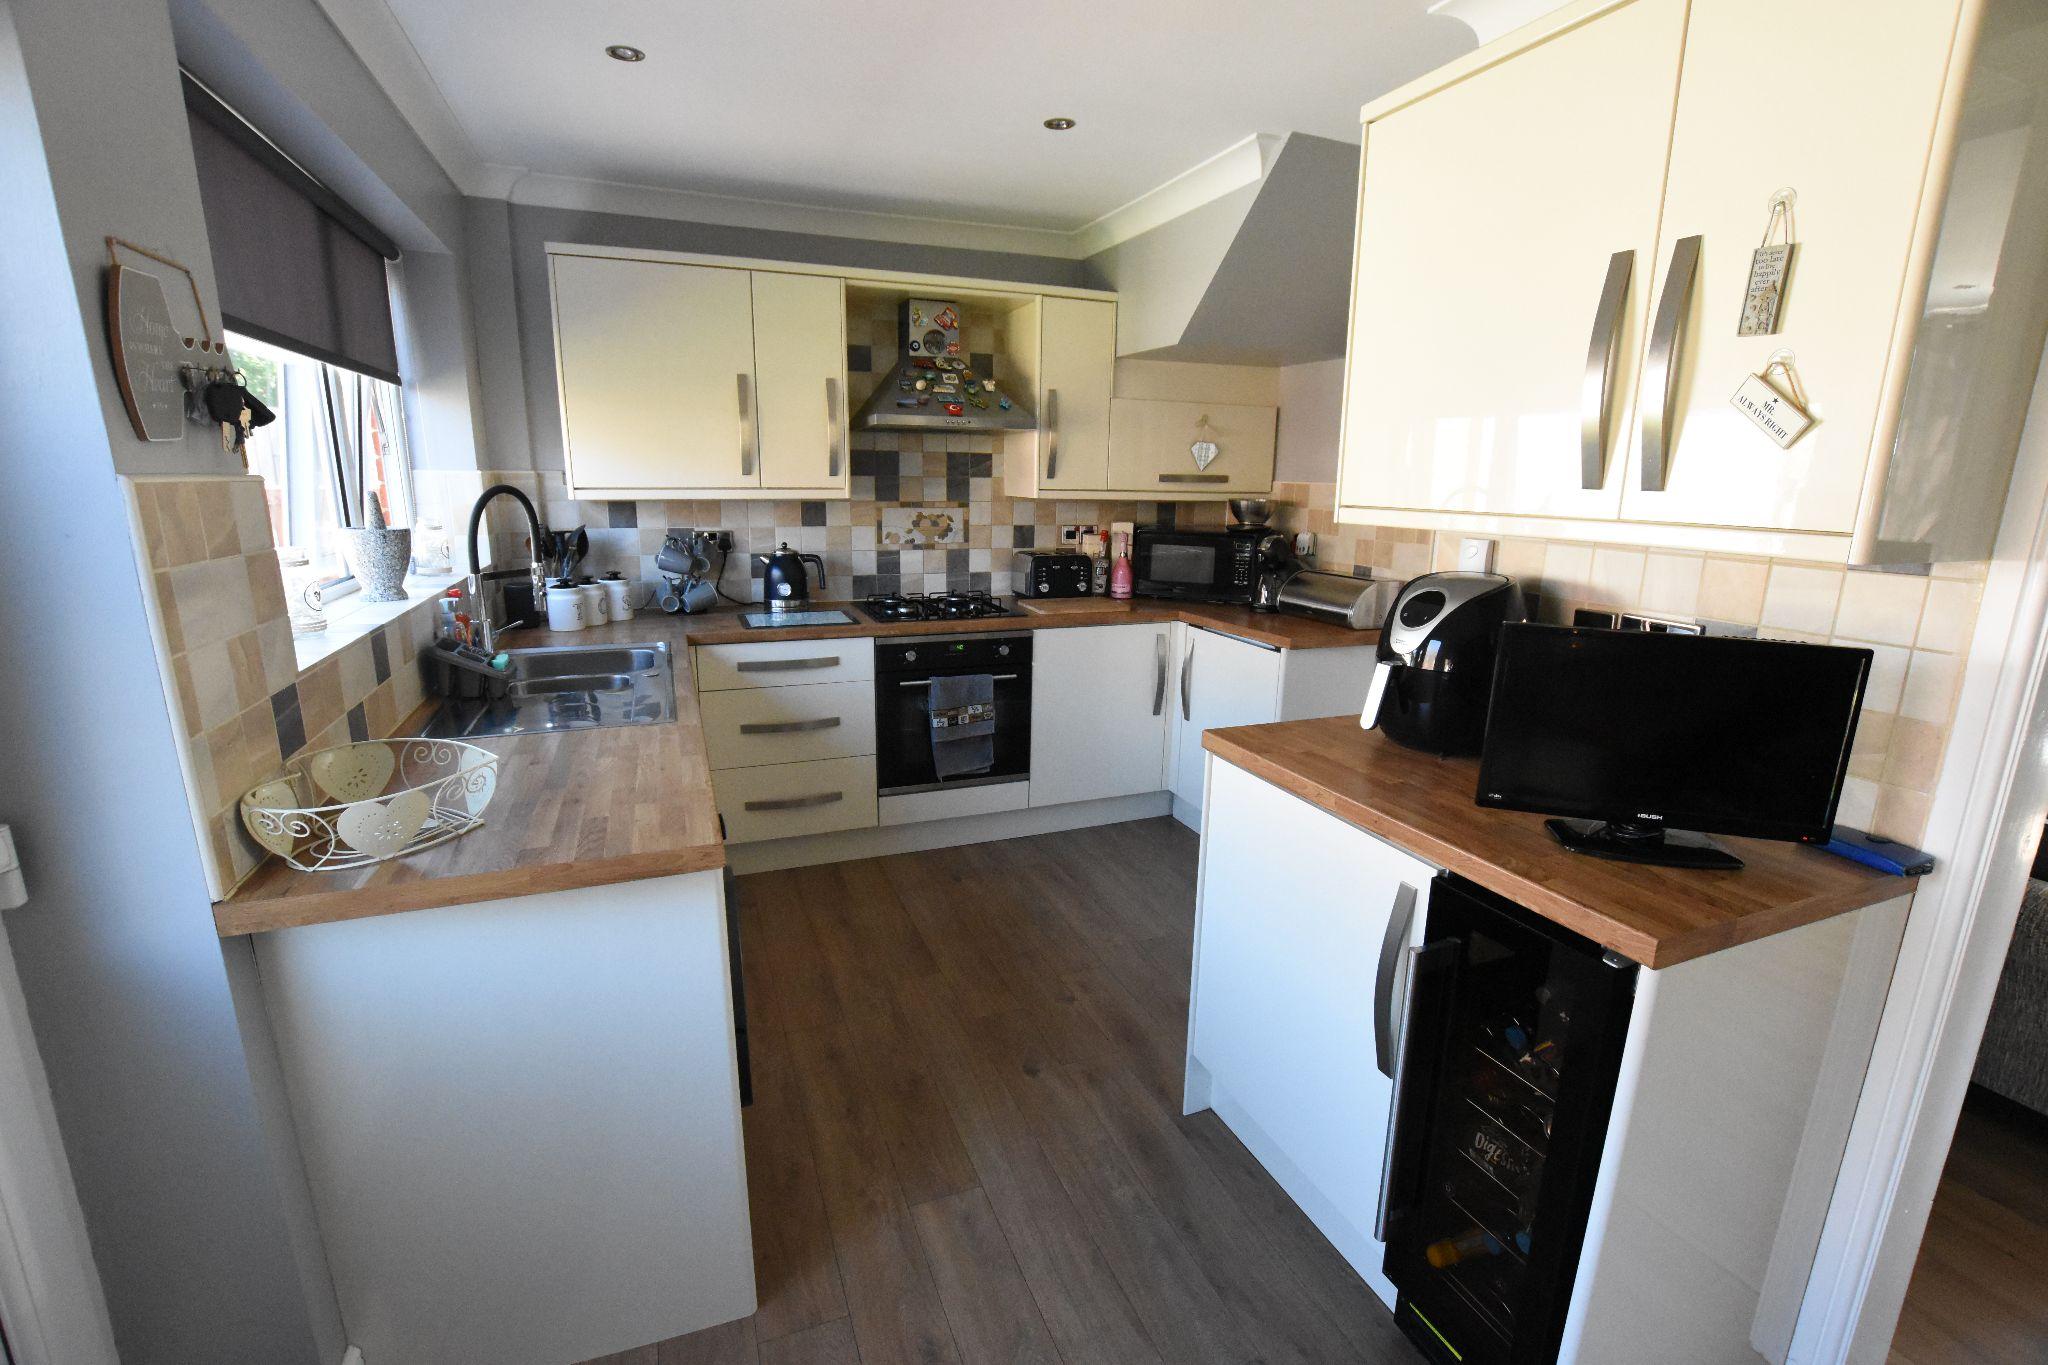 3 bedroom semi-detached house Sold STC in Preston - Kitchen Diner